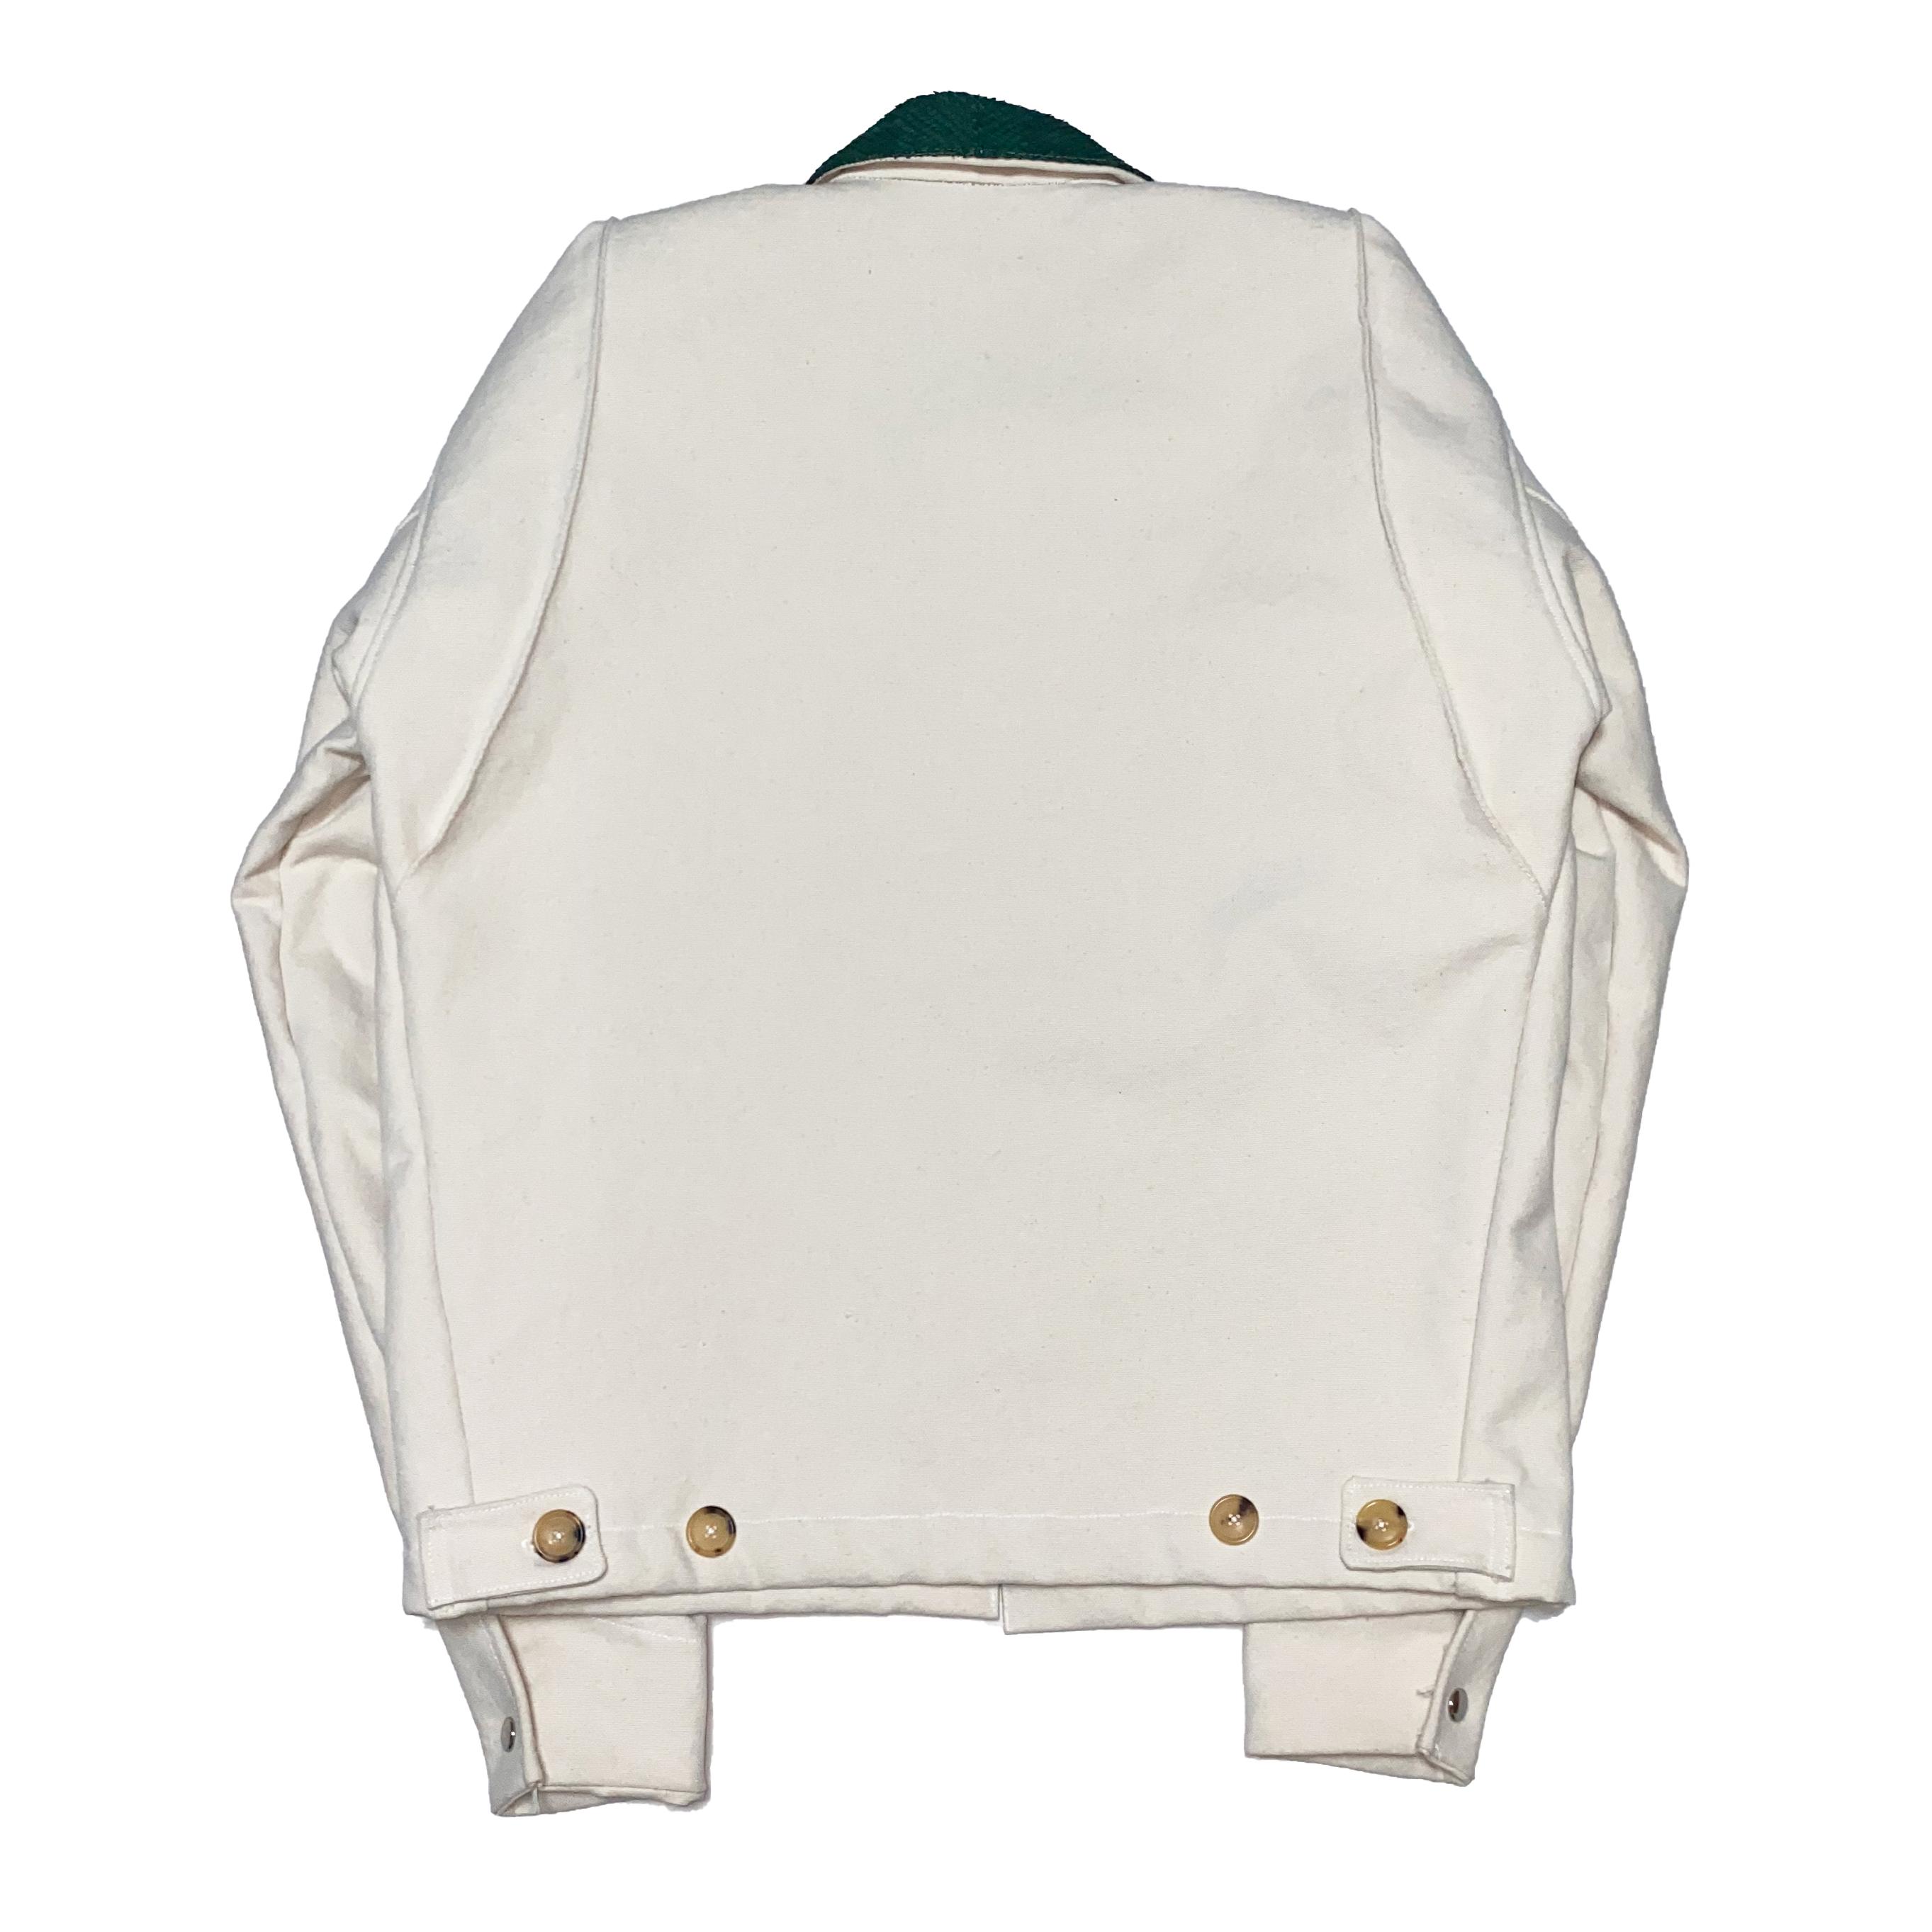 Petroit Work Jacket / White - 画像2